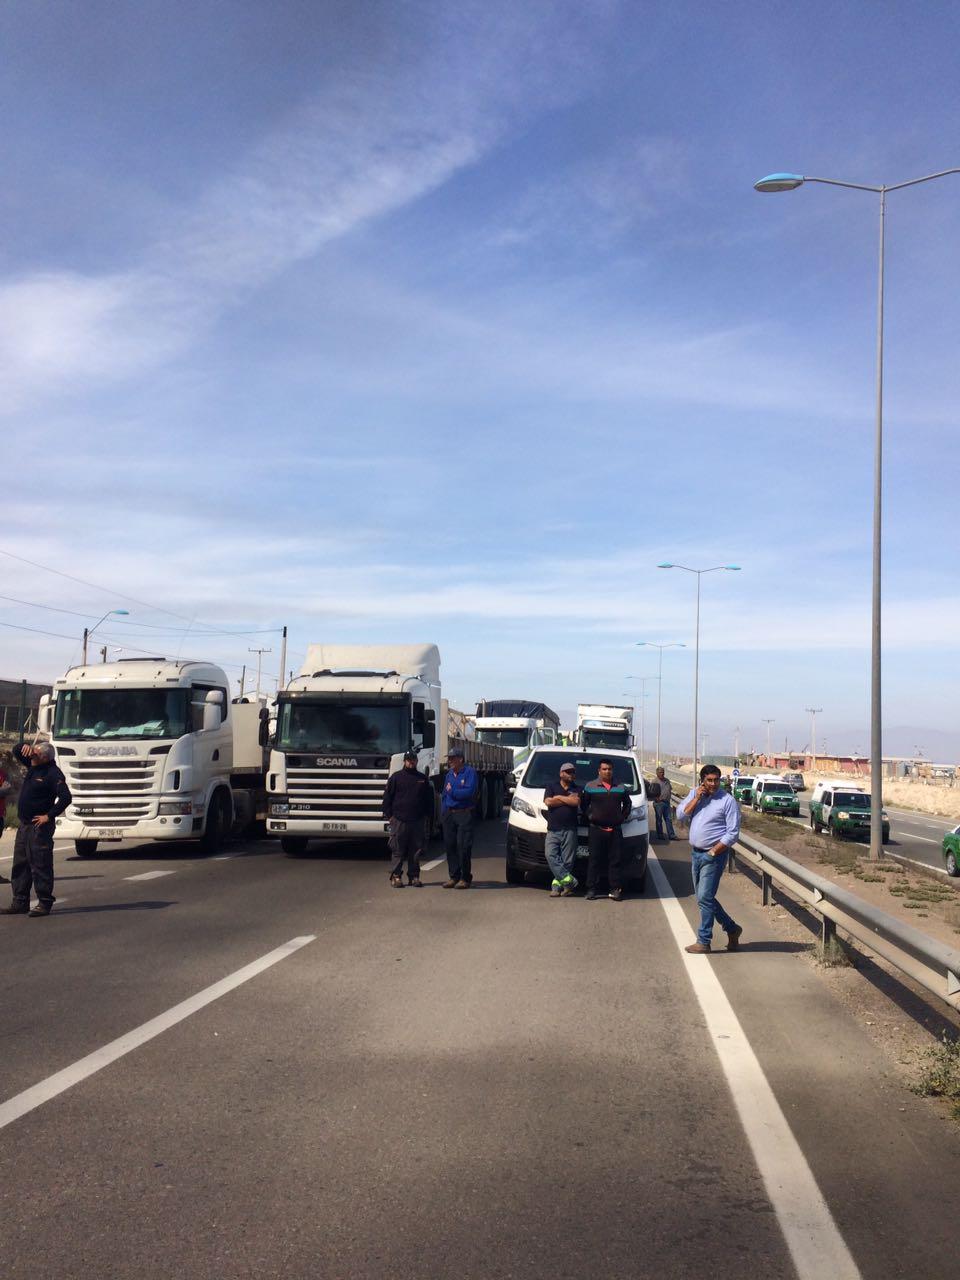 toma de carretera en Vallenar